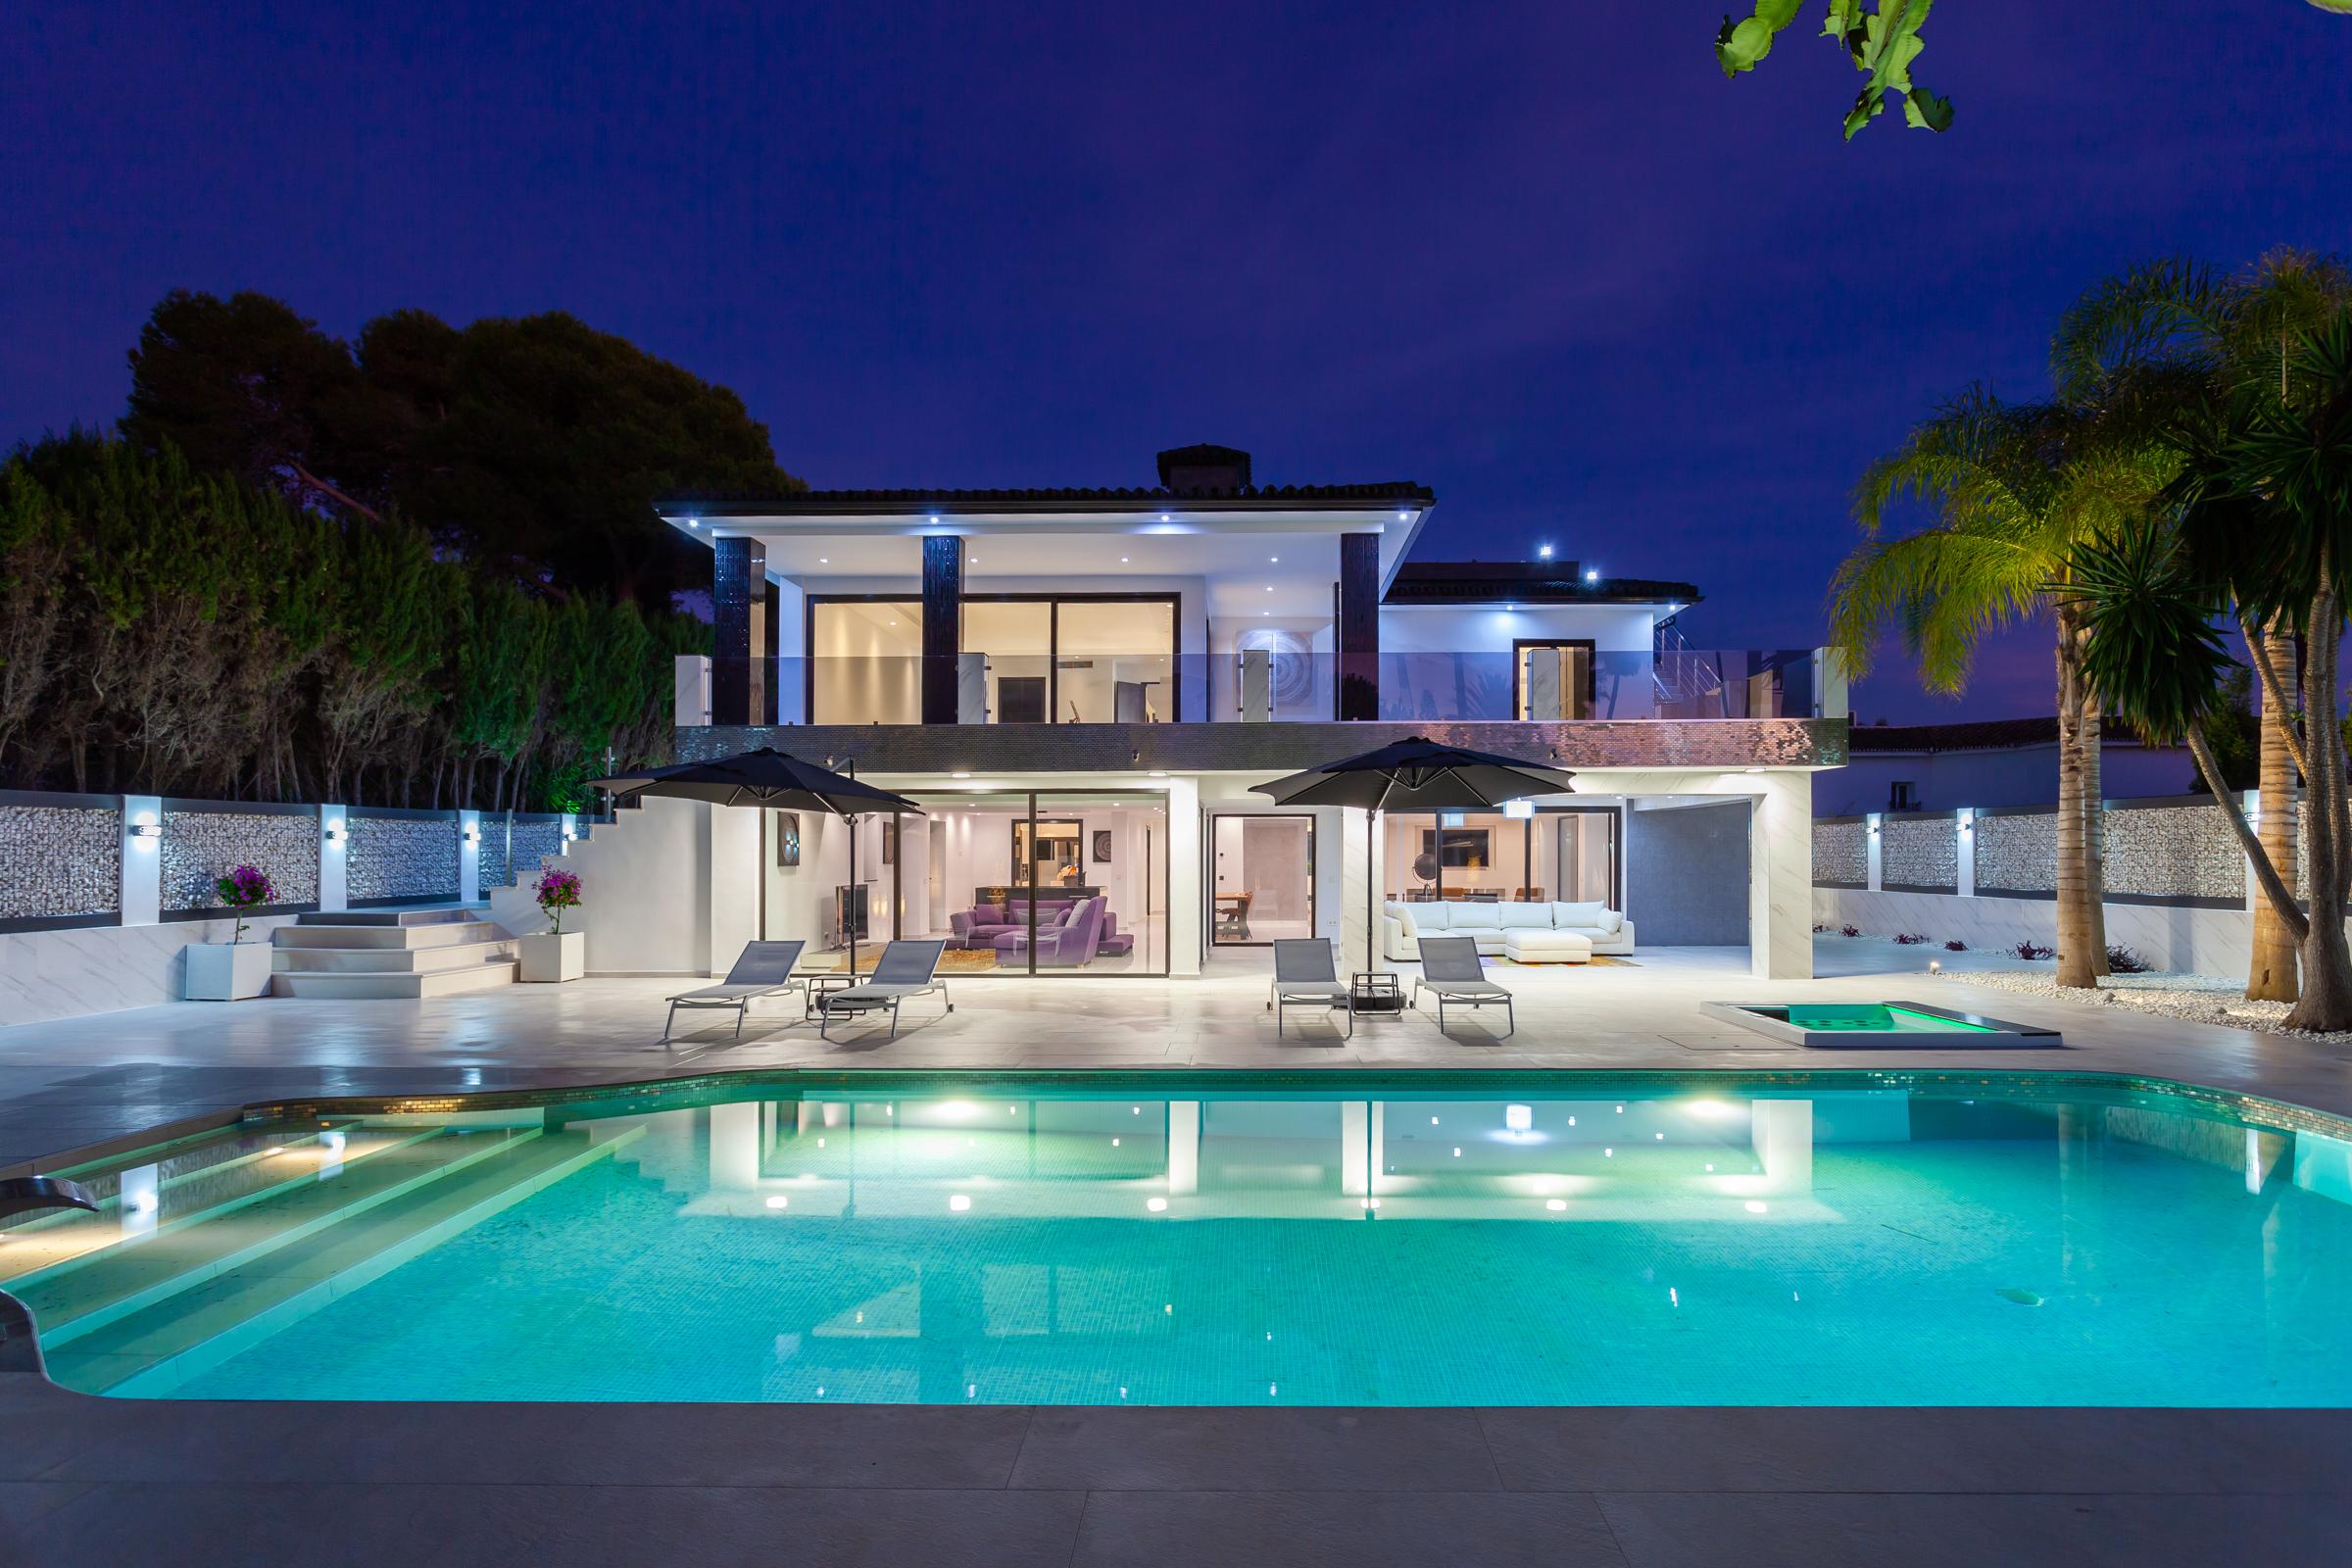 359-00025P: Villa in Marbella